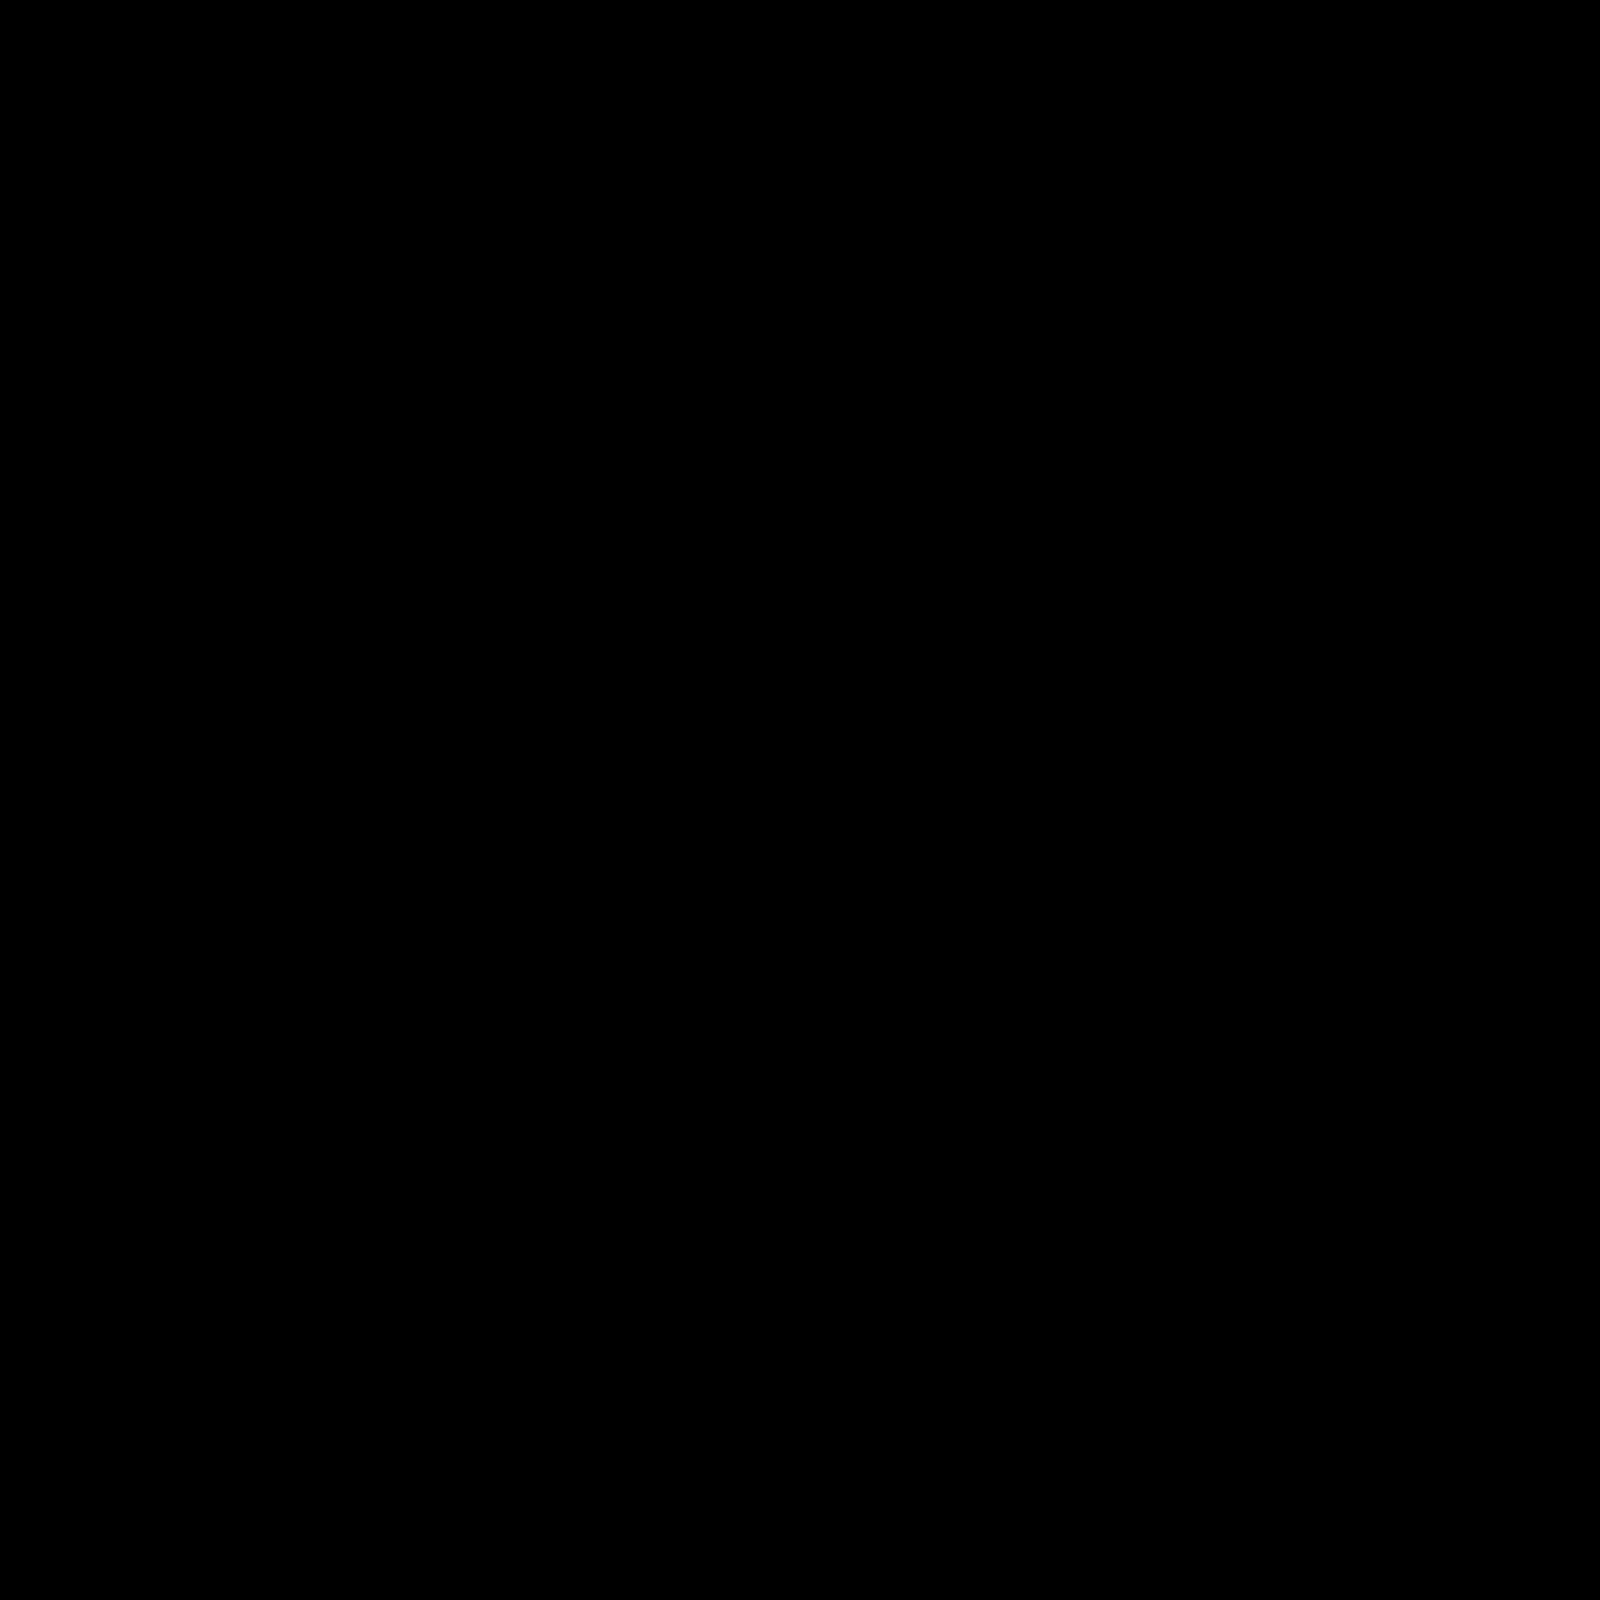 Alarm baterii icon